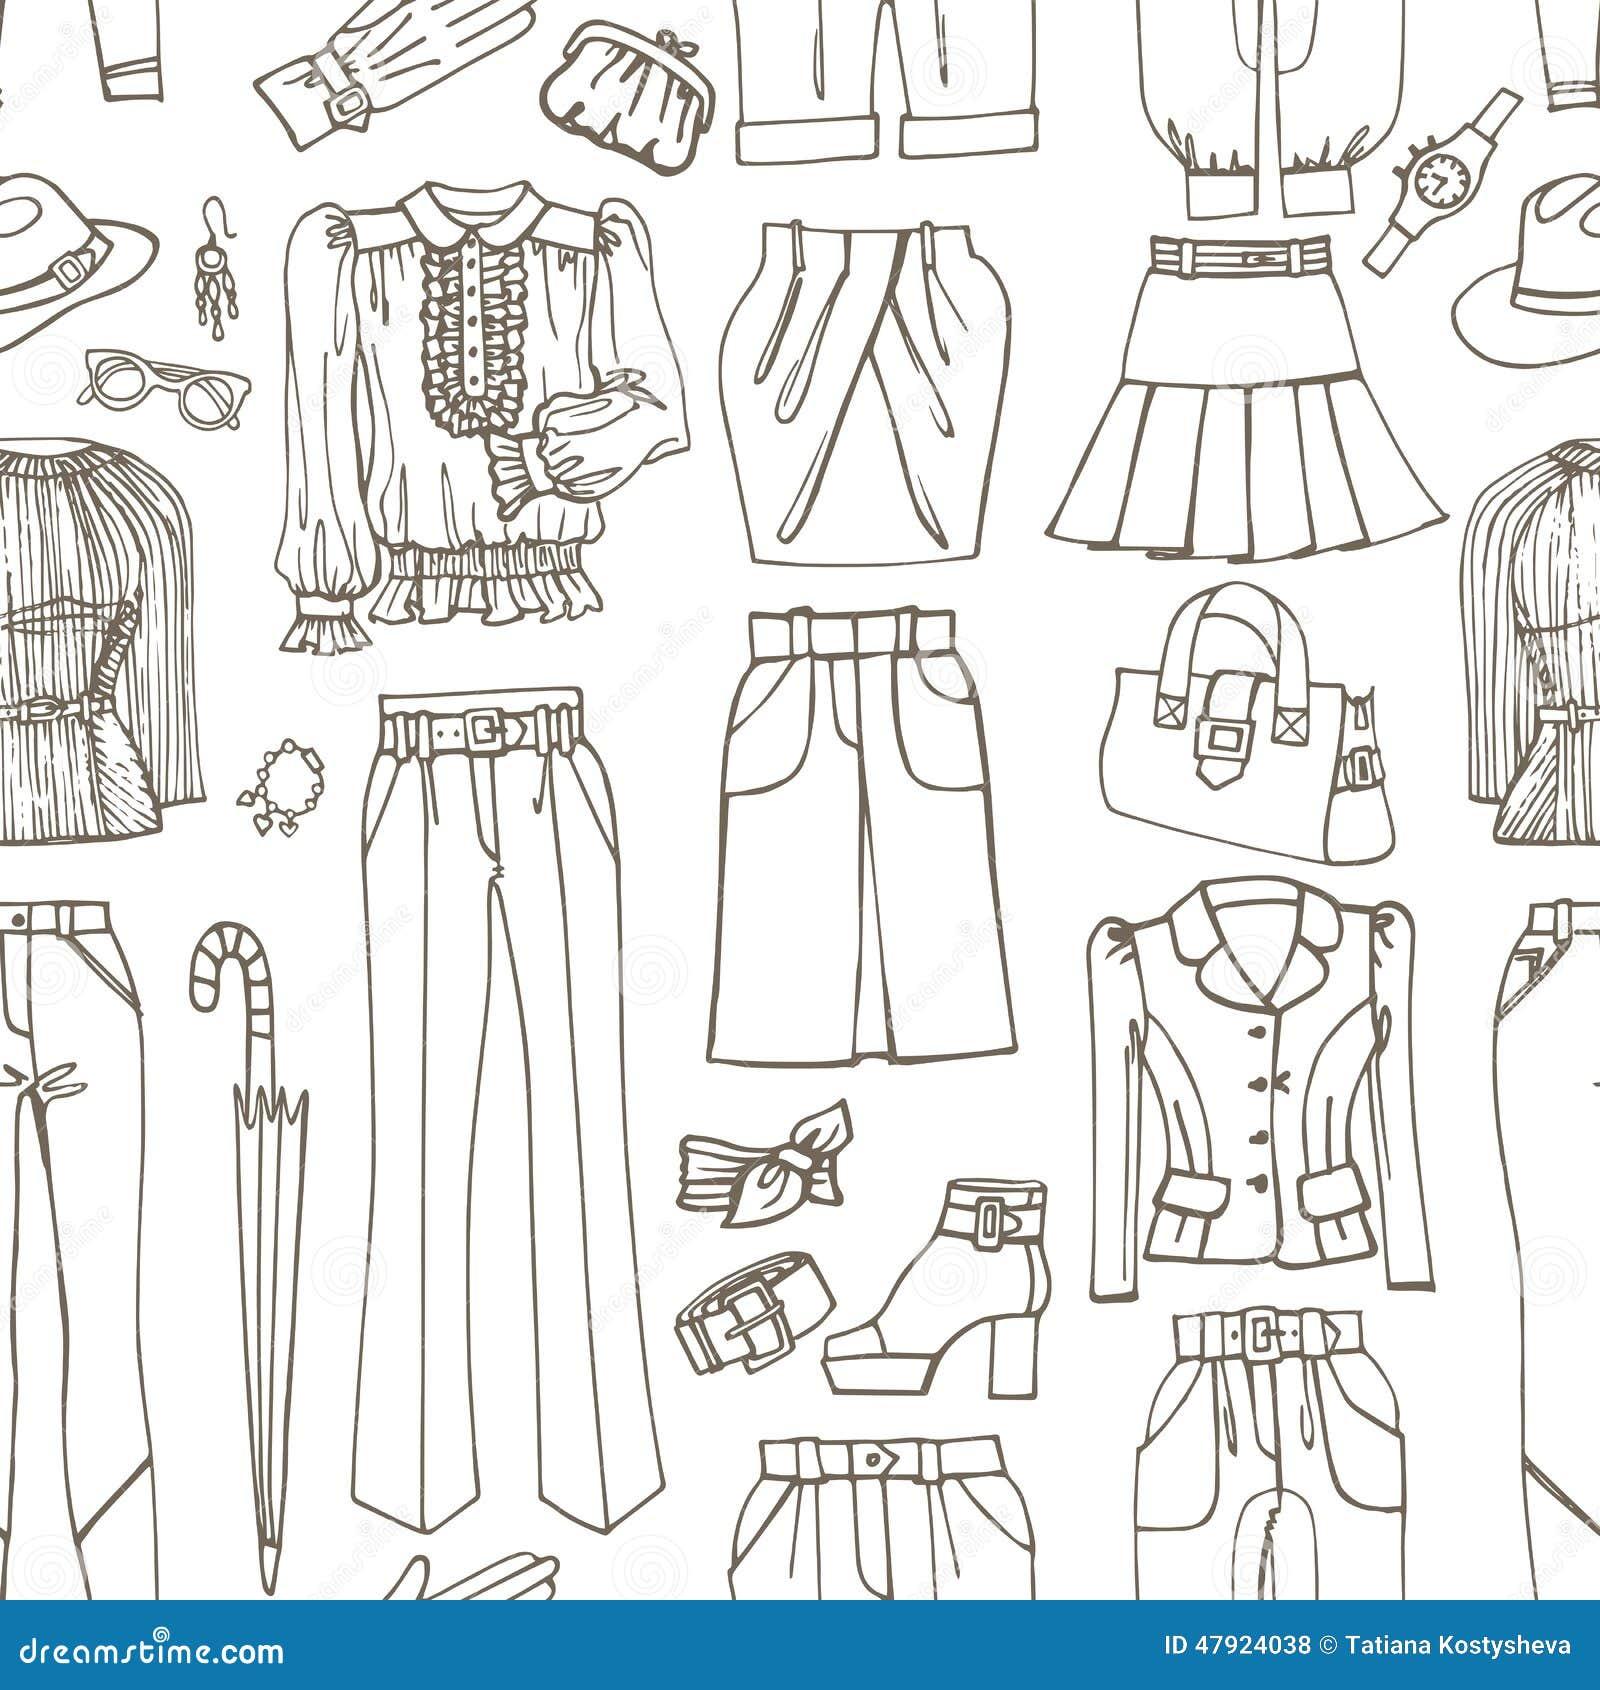 Clothing Outlines Fashion Illustration